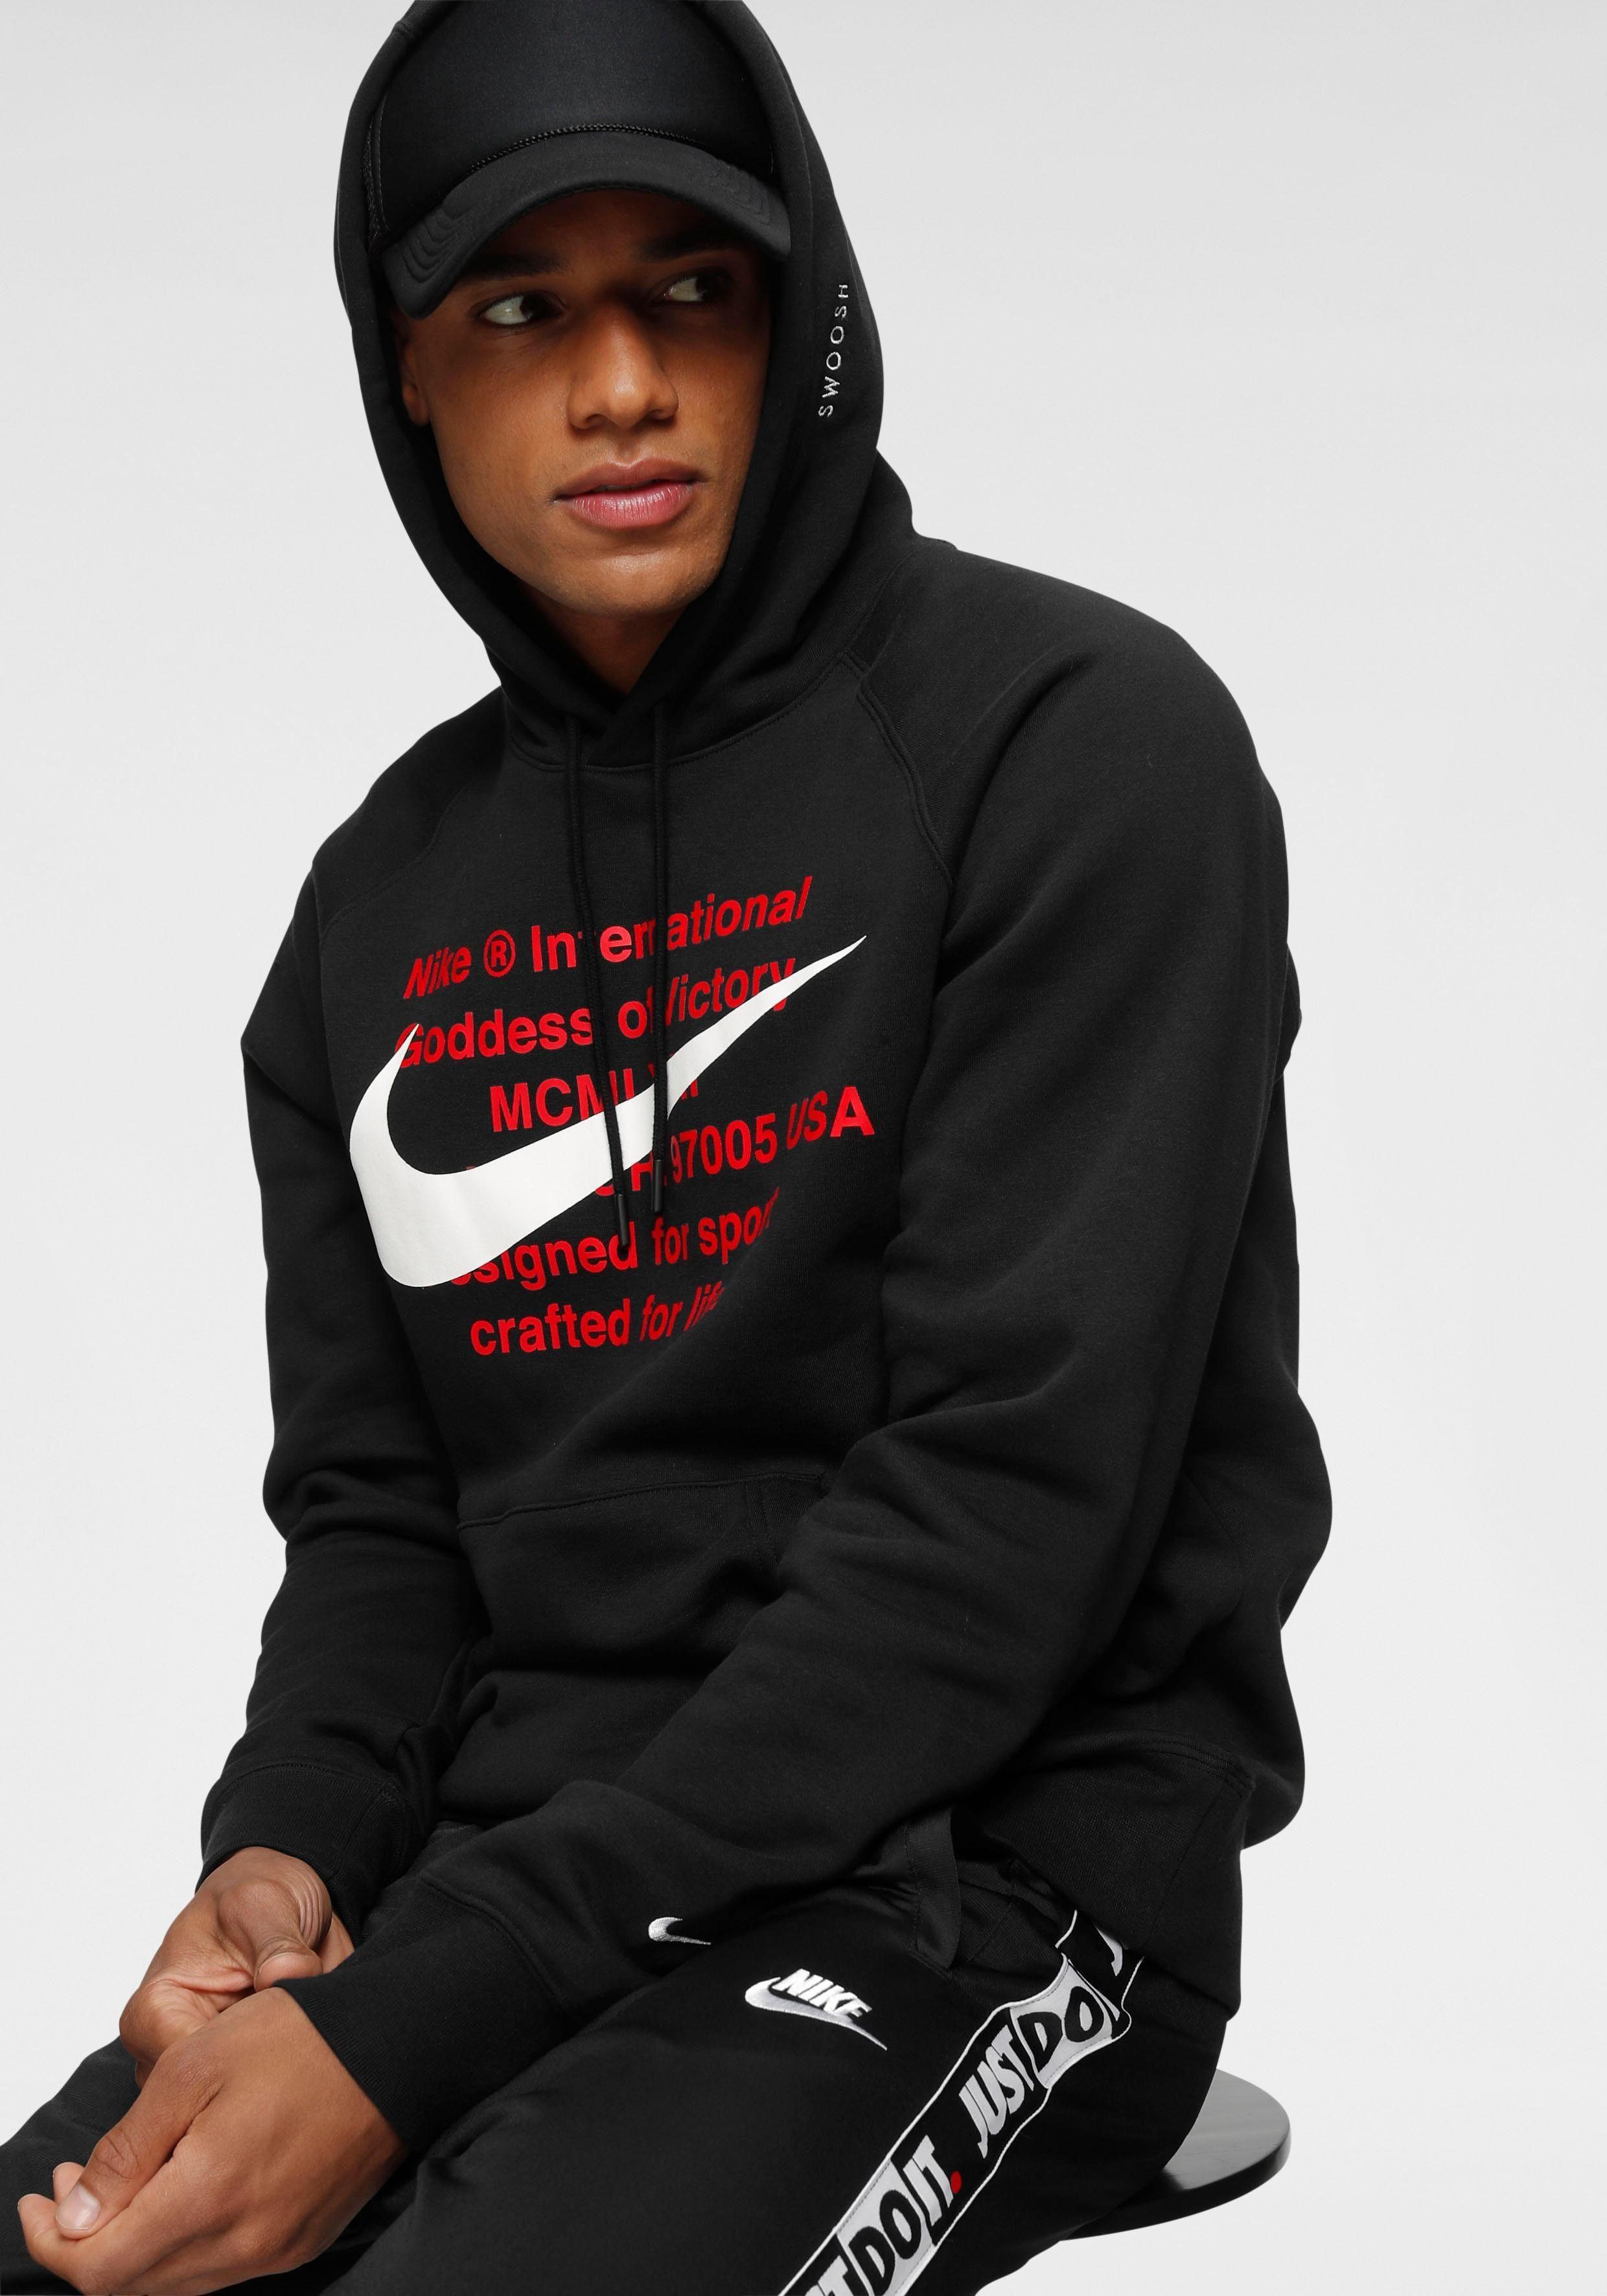 schwarzer nike hoodie mit rotem nike logo